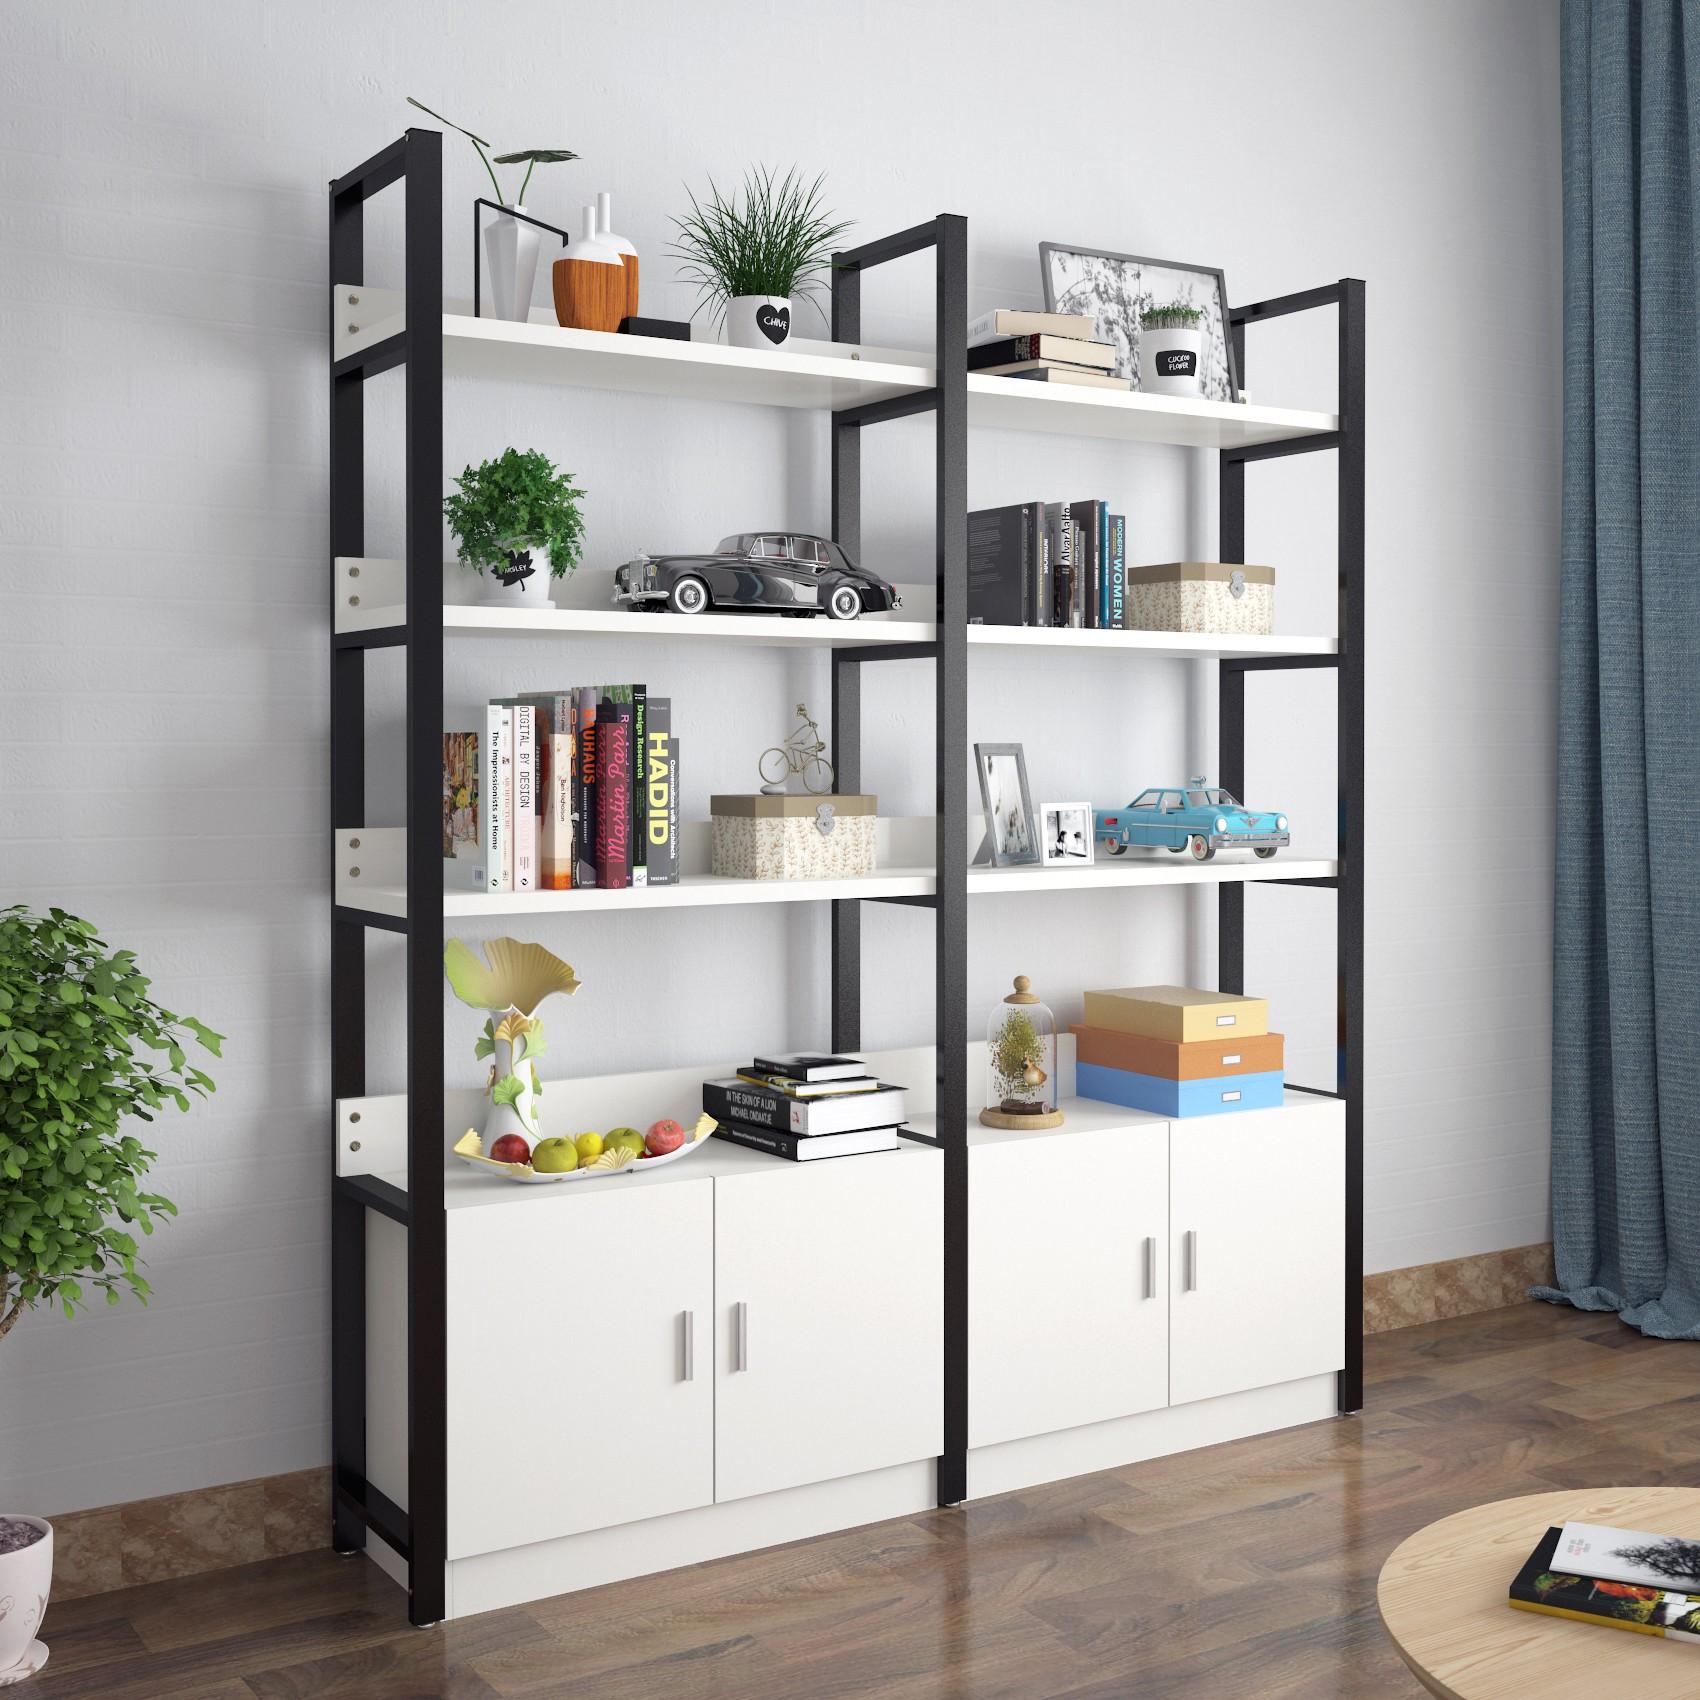 Shelf Simple Modern Iron Partition Shelf Simple Floor Steel Wooden Bookcase  Flower Shelf Living Room Multi